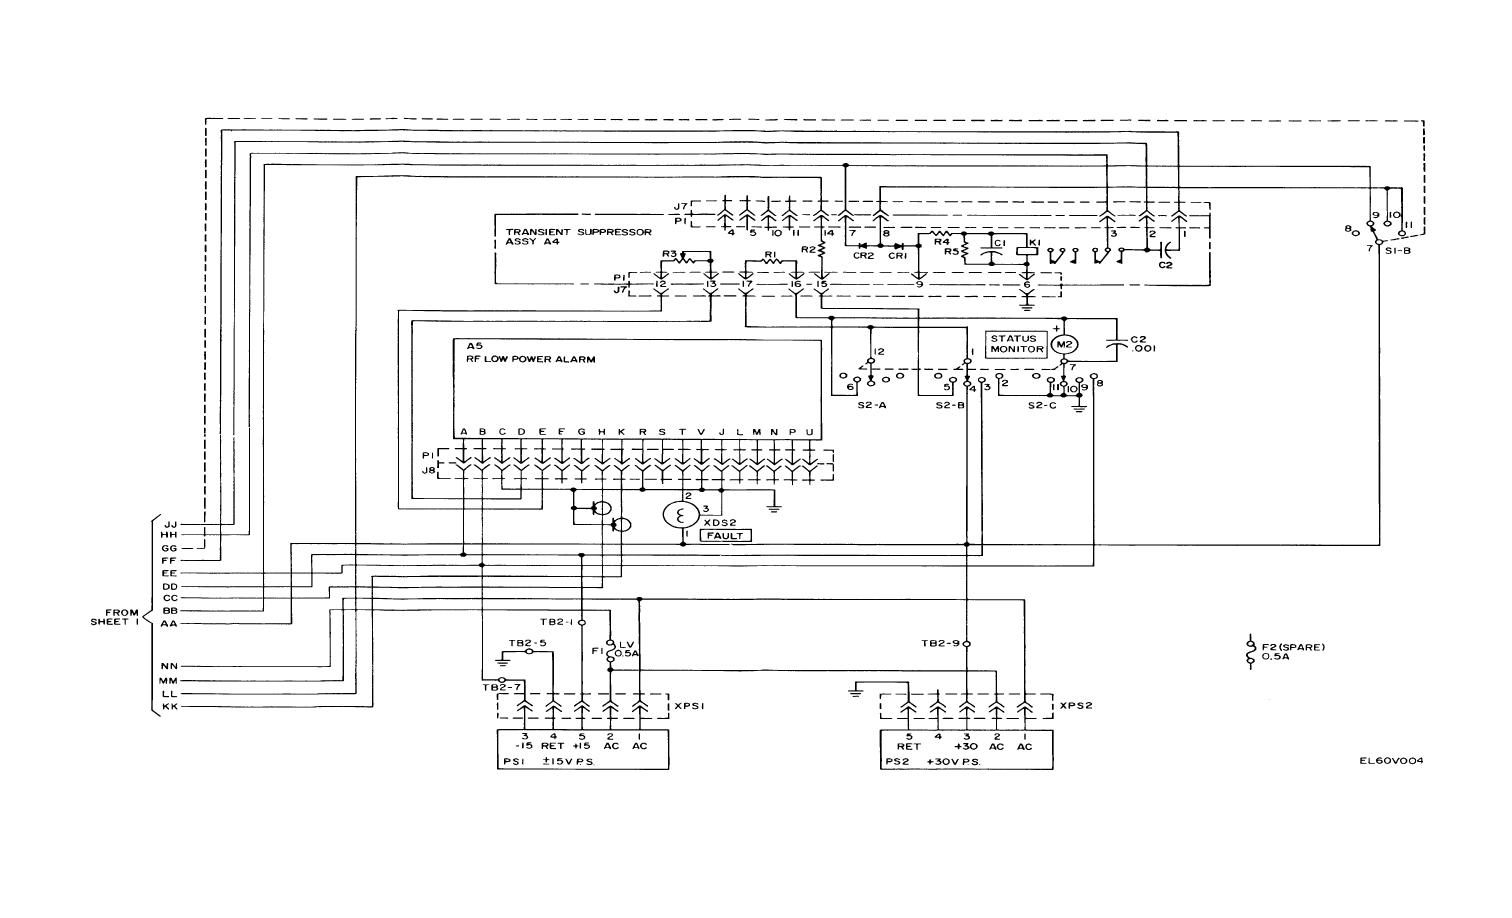 Figure FO-2. (2). Amplifier-Mixer Schematic Diagram (Sheet